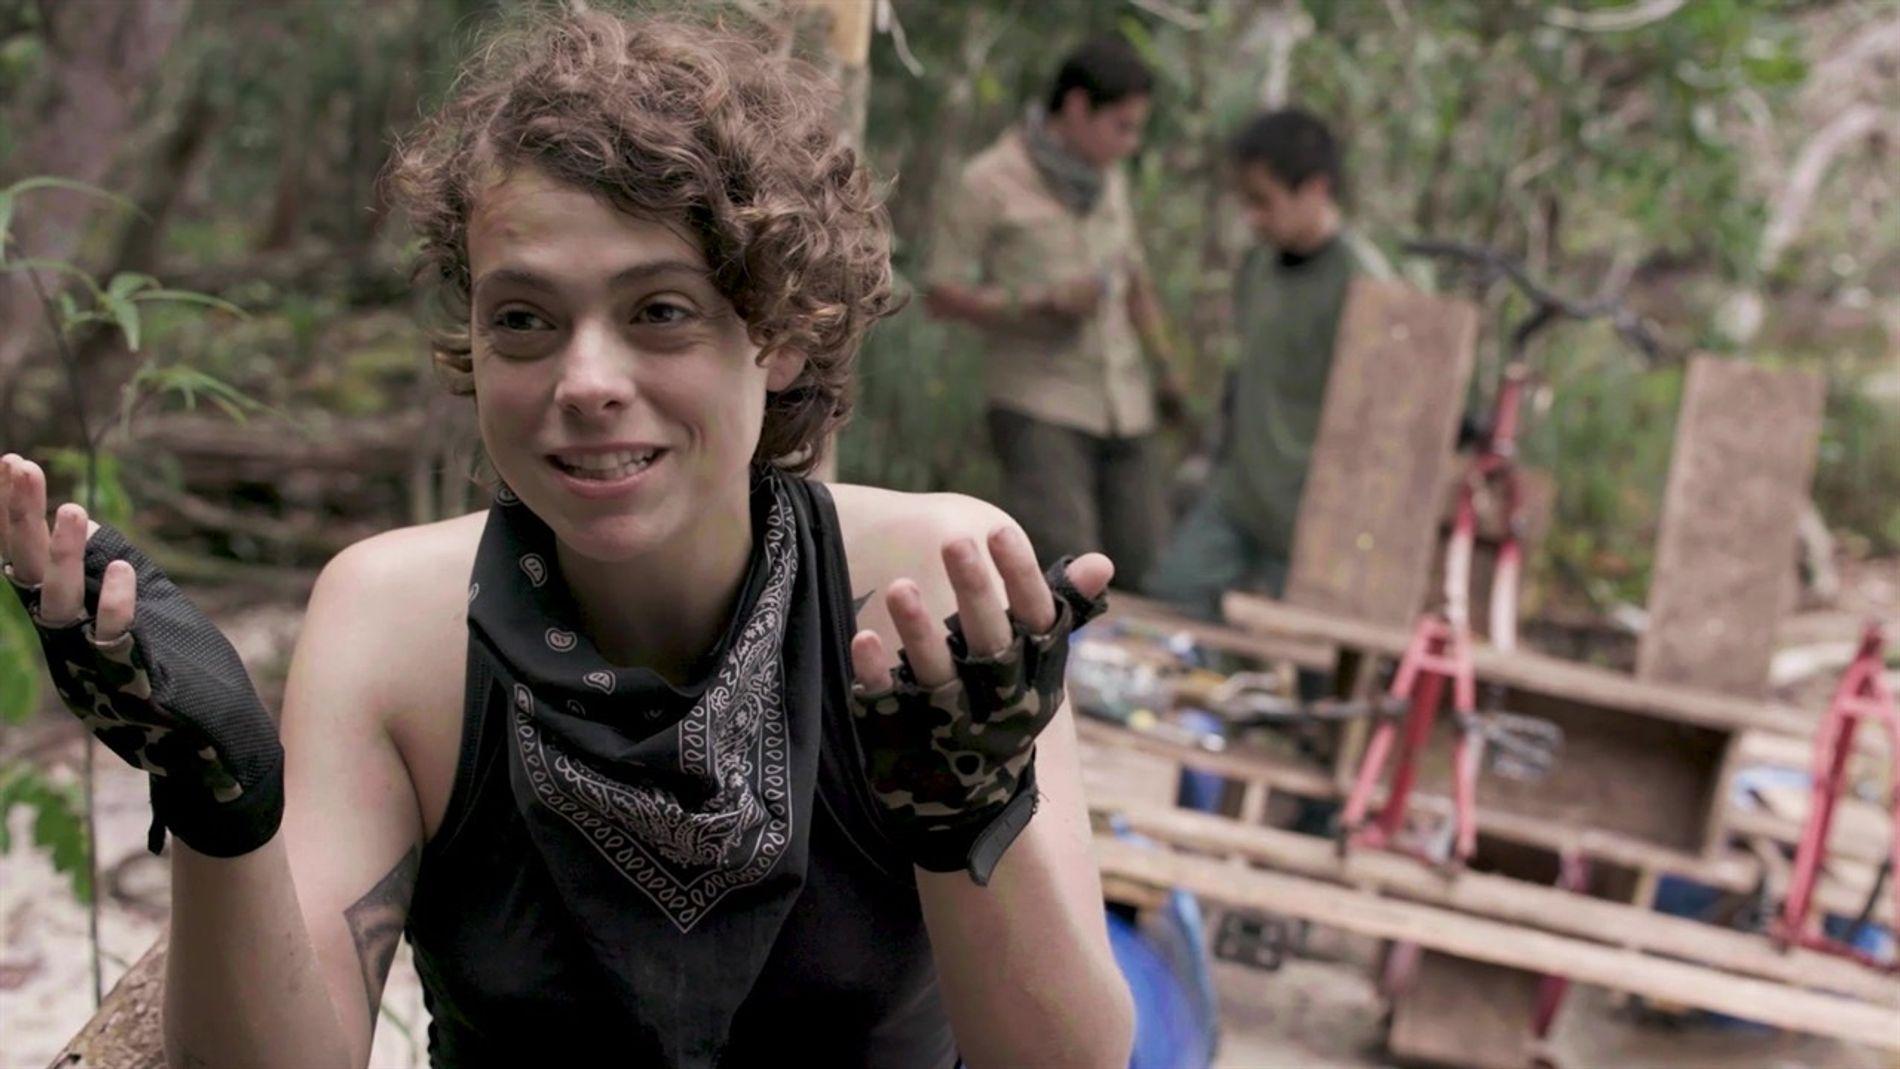 Desafio Impossível: Conheça a participante Gabriella Brant